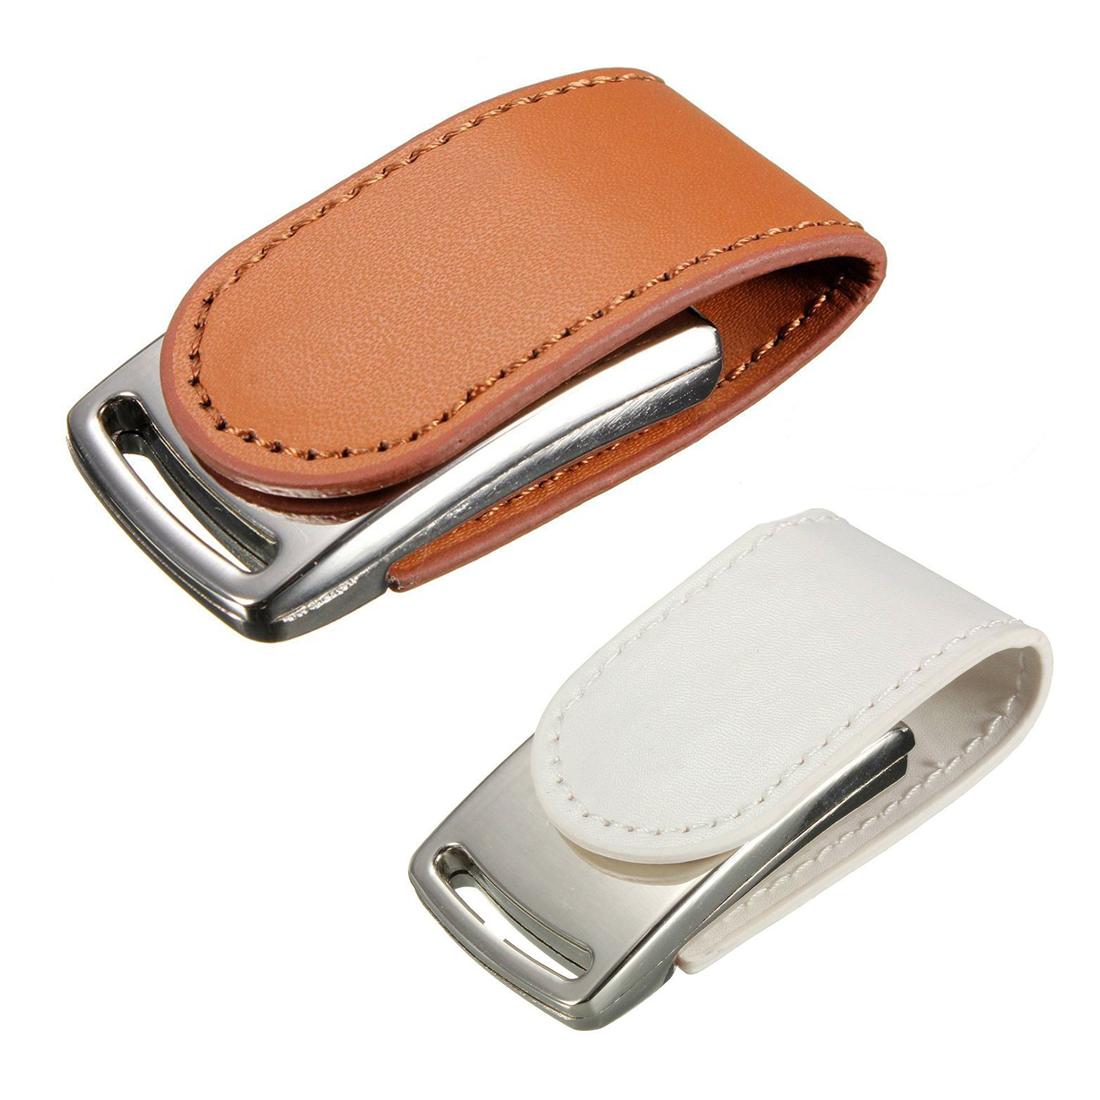 usb 2 0 memory memory stick mini leather flash drive gift. Black Bedroom Furniture Sets. Home Design Ideas